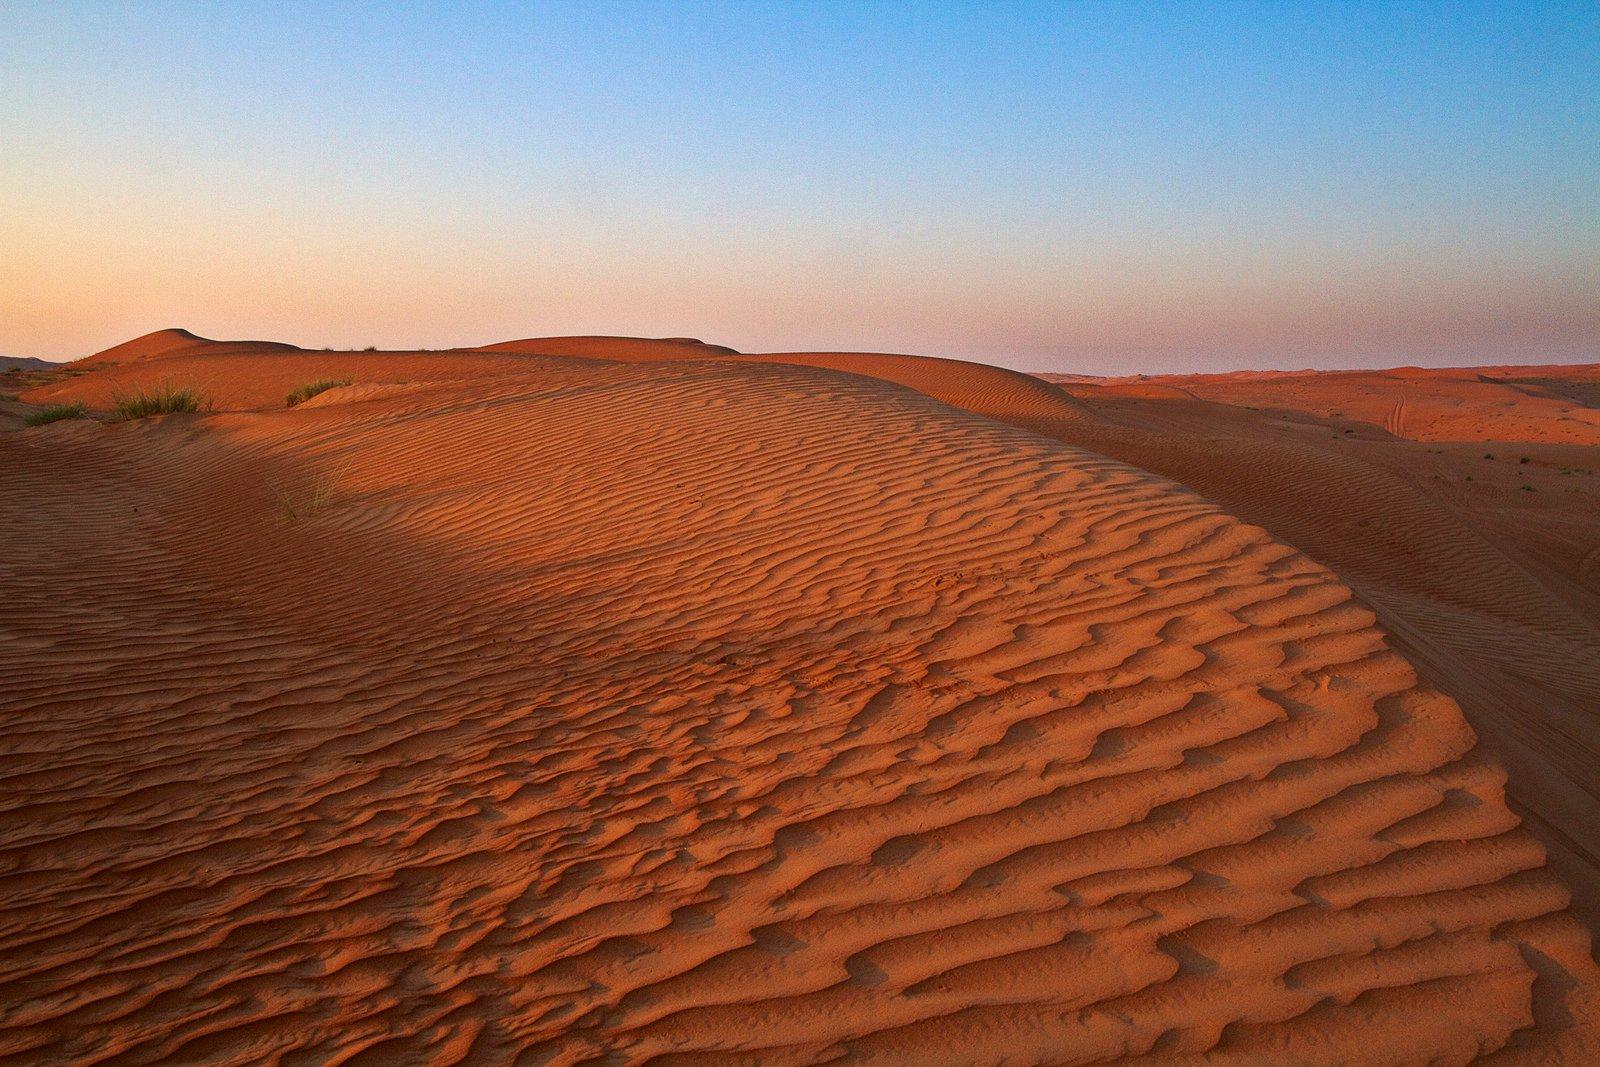 Sunrise at Wahiba Sands, Oman